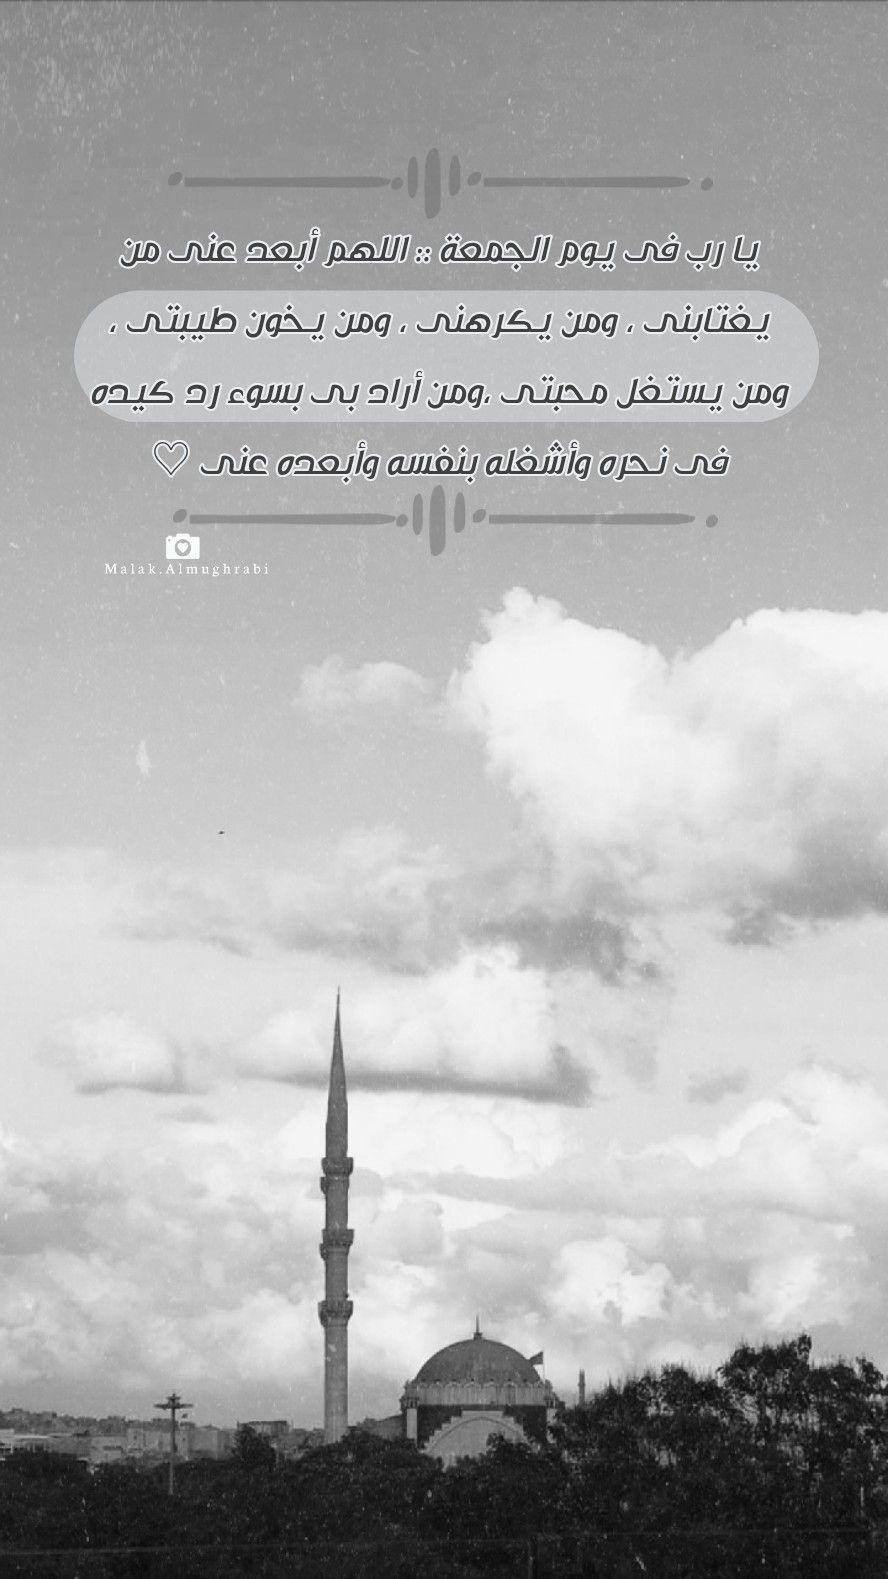 قرب لي كل خير وابعد عني كل شر يارب Quran Quotes Love Islamic Images Beautiful Islamic Quotes